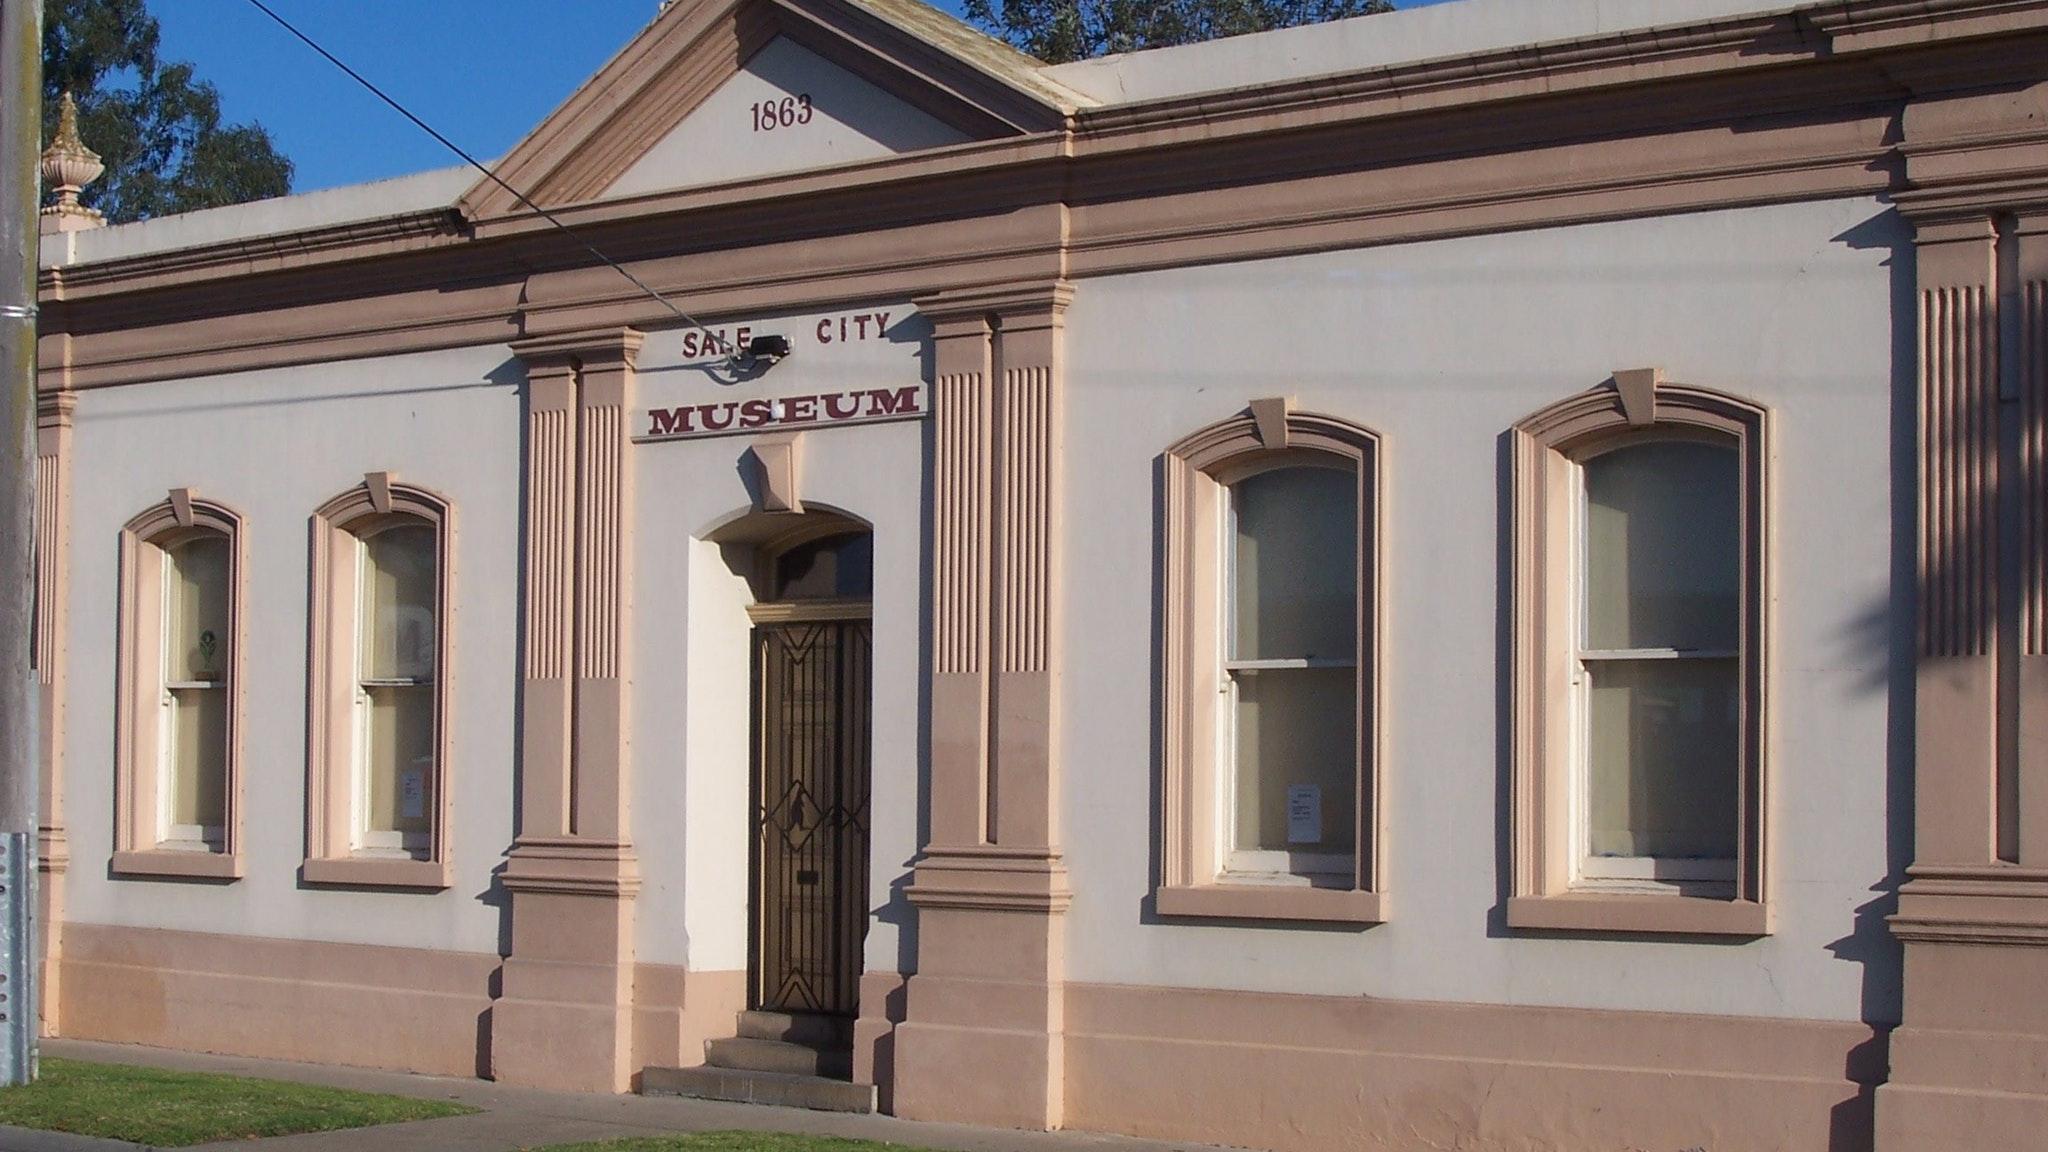 Sale City Museum